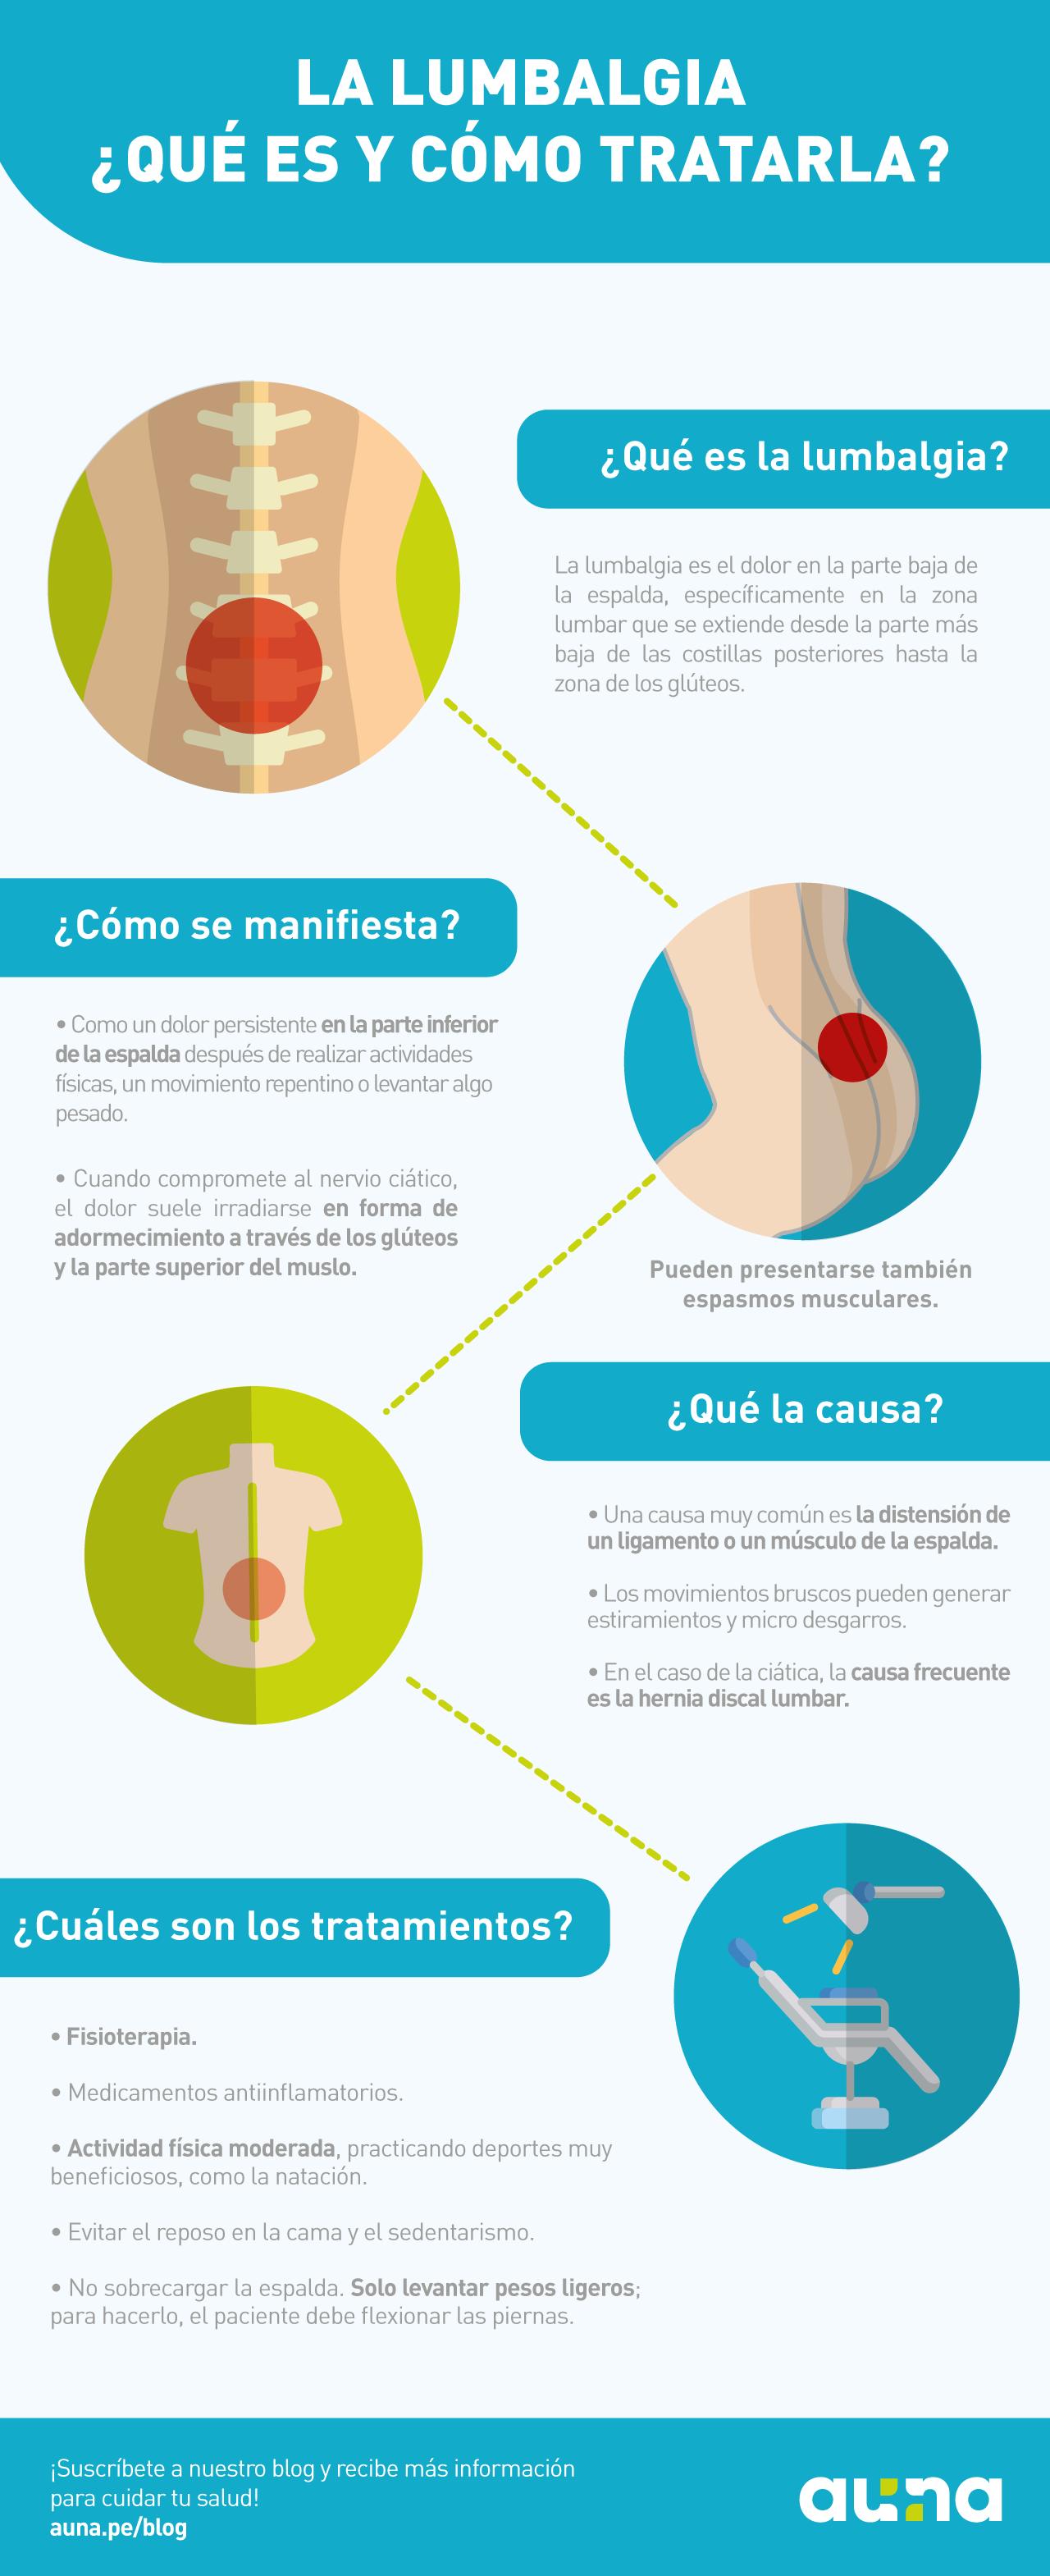 infografia-que-es-lumbalgia-tratamiento